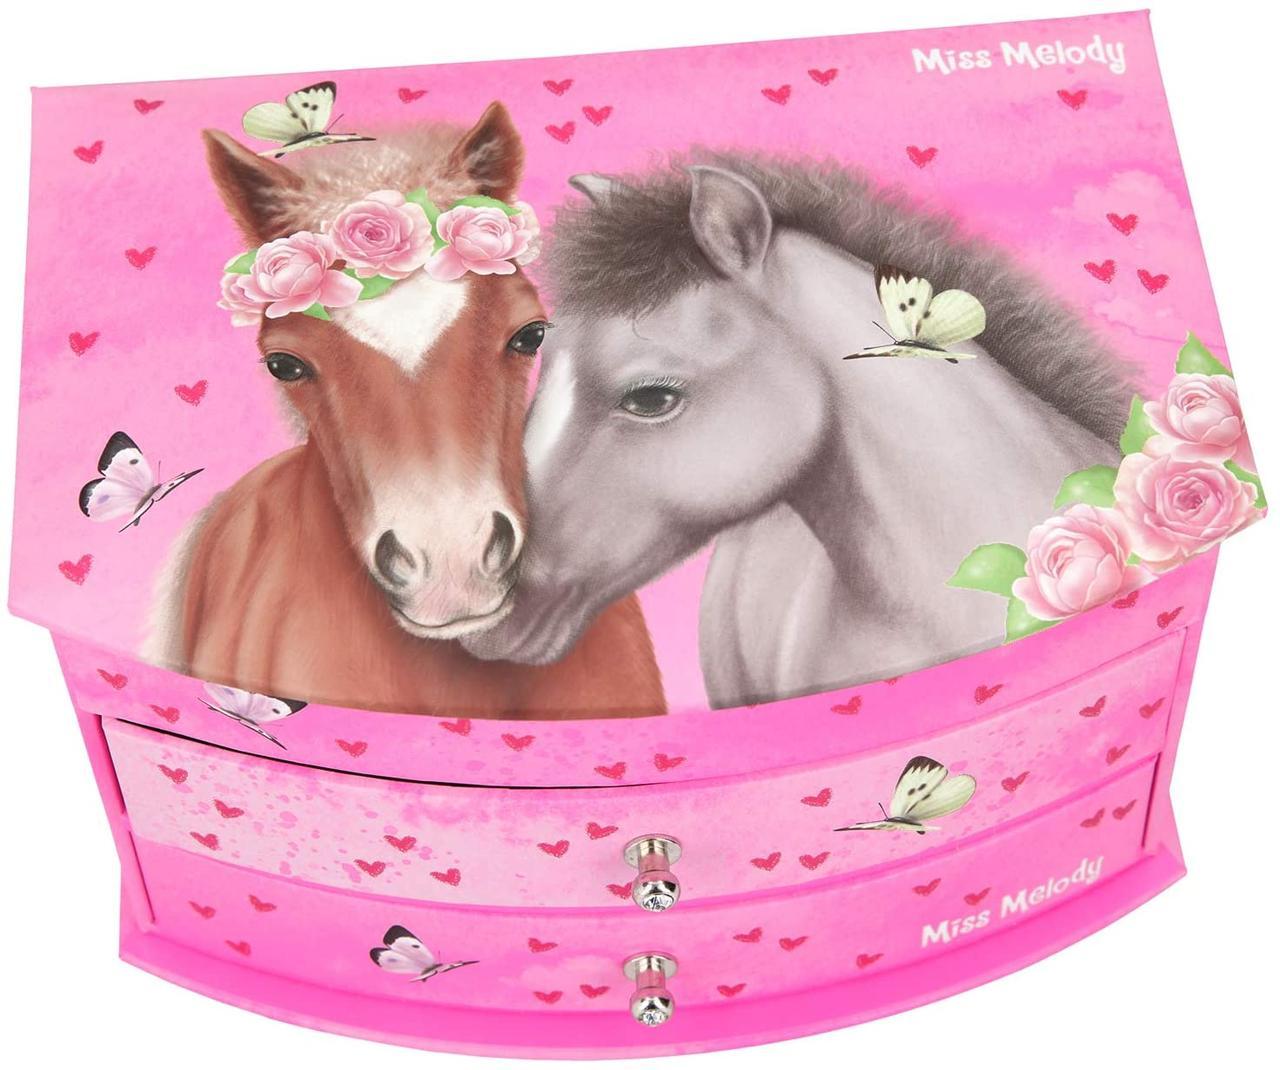 Top Model шкатулка для прикрас рожева Miss Melody Depesche ( Шкатулка с зеркалом Топ Модел Мисс Мелоди )